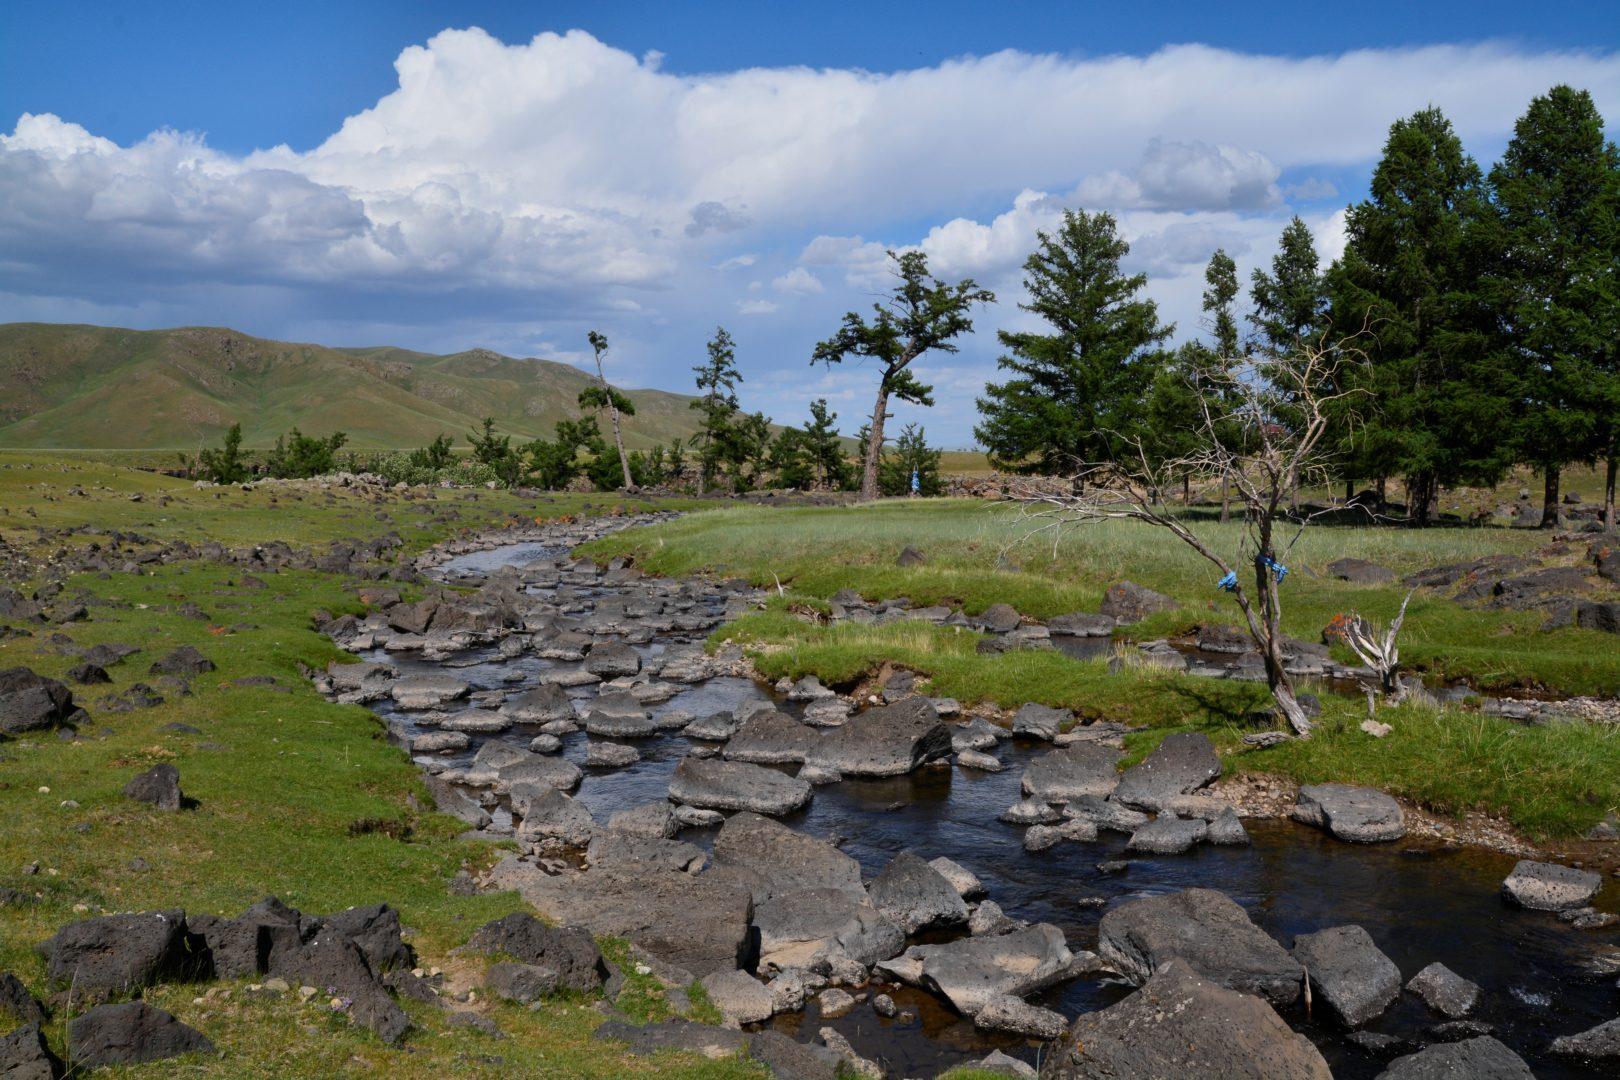 Gobi und Steppe: Steppe